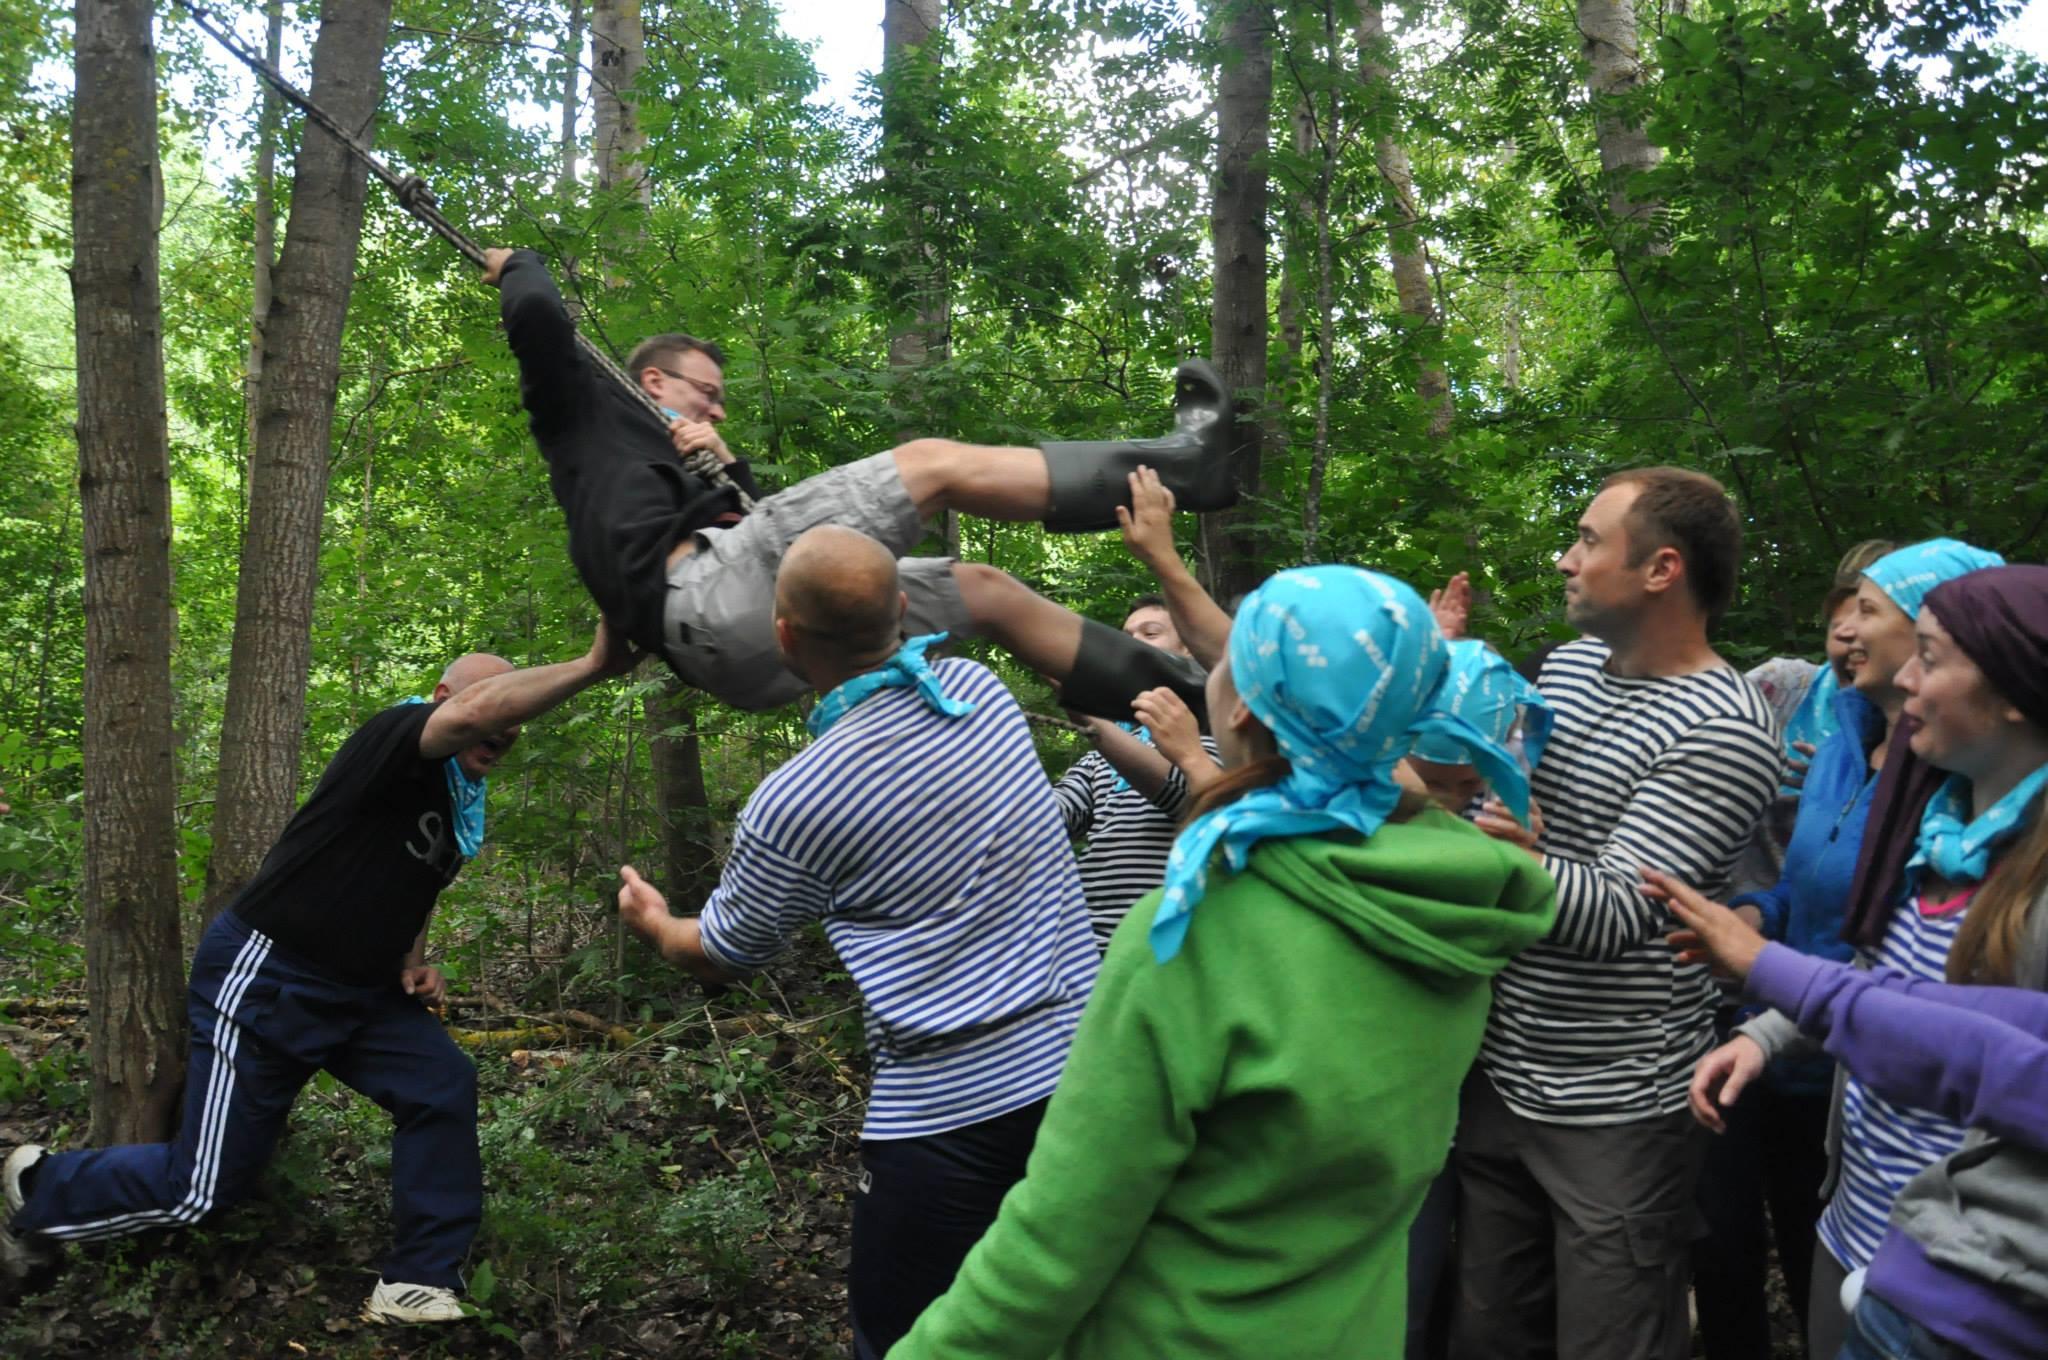 Summer Pirushka 2015